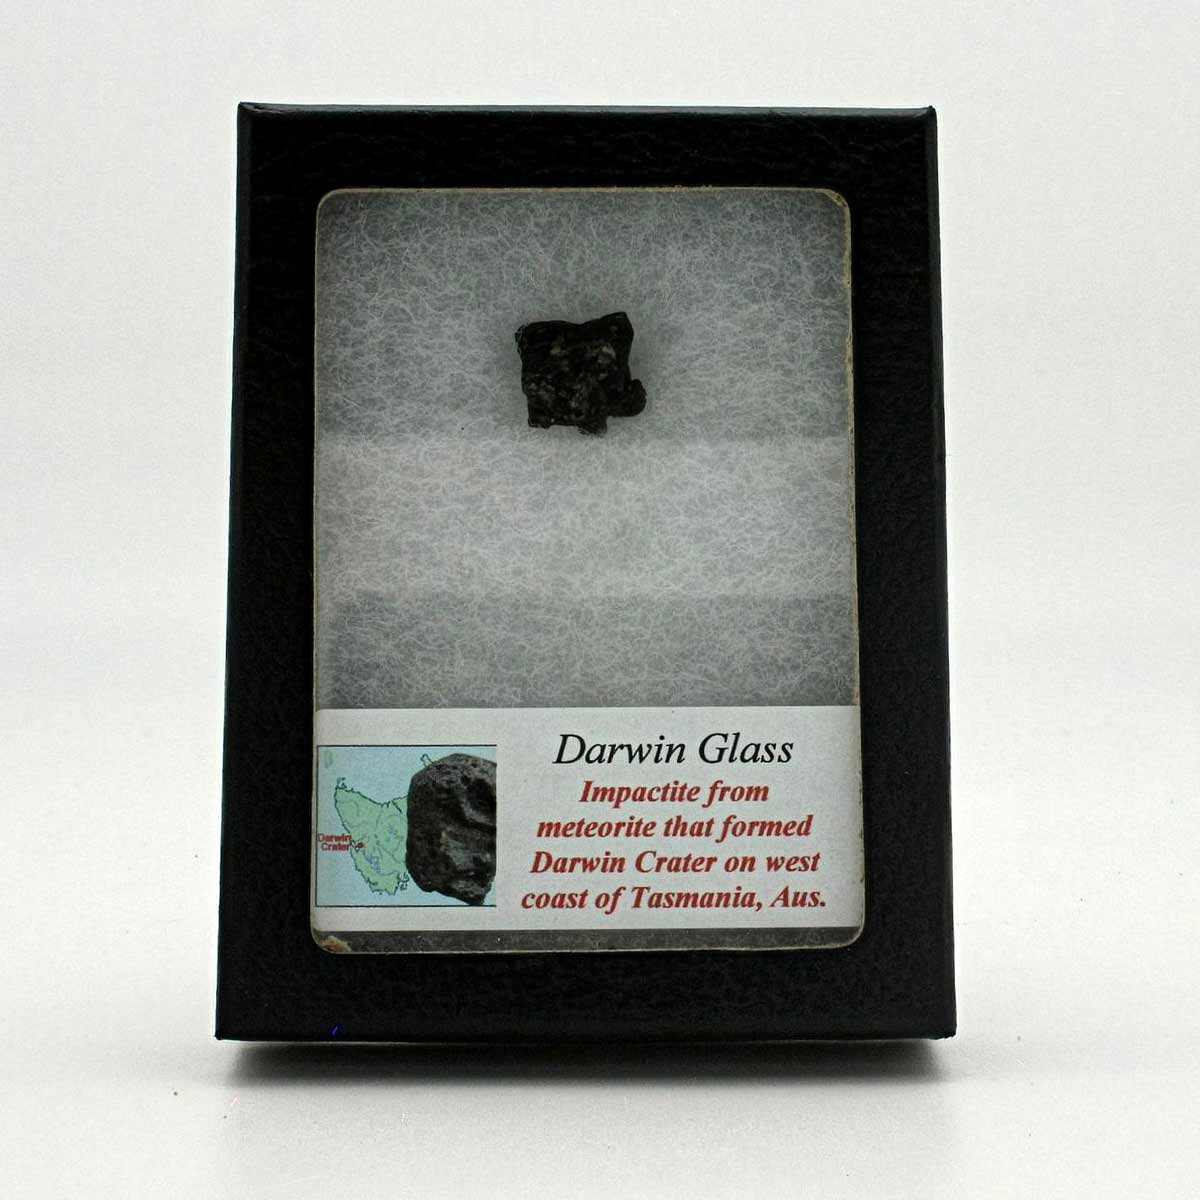 Darwin Glass